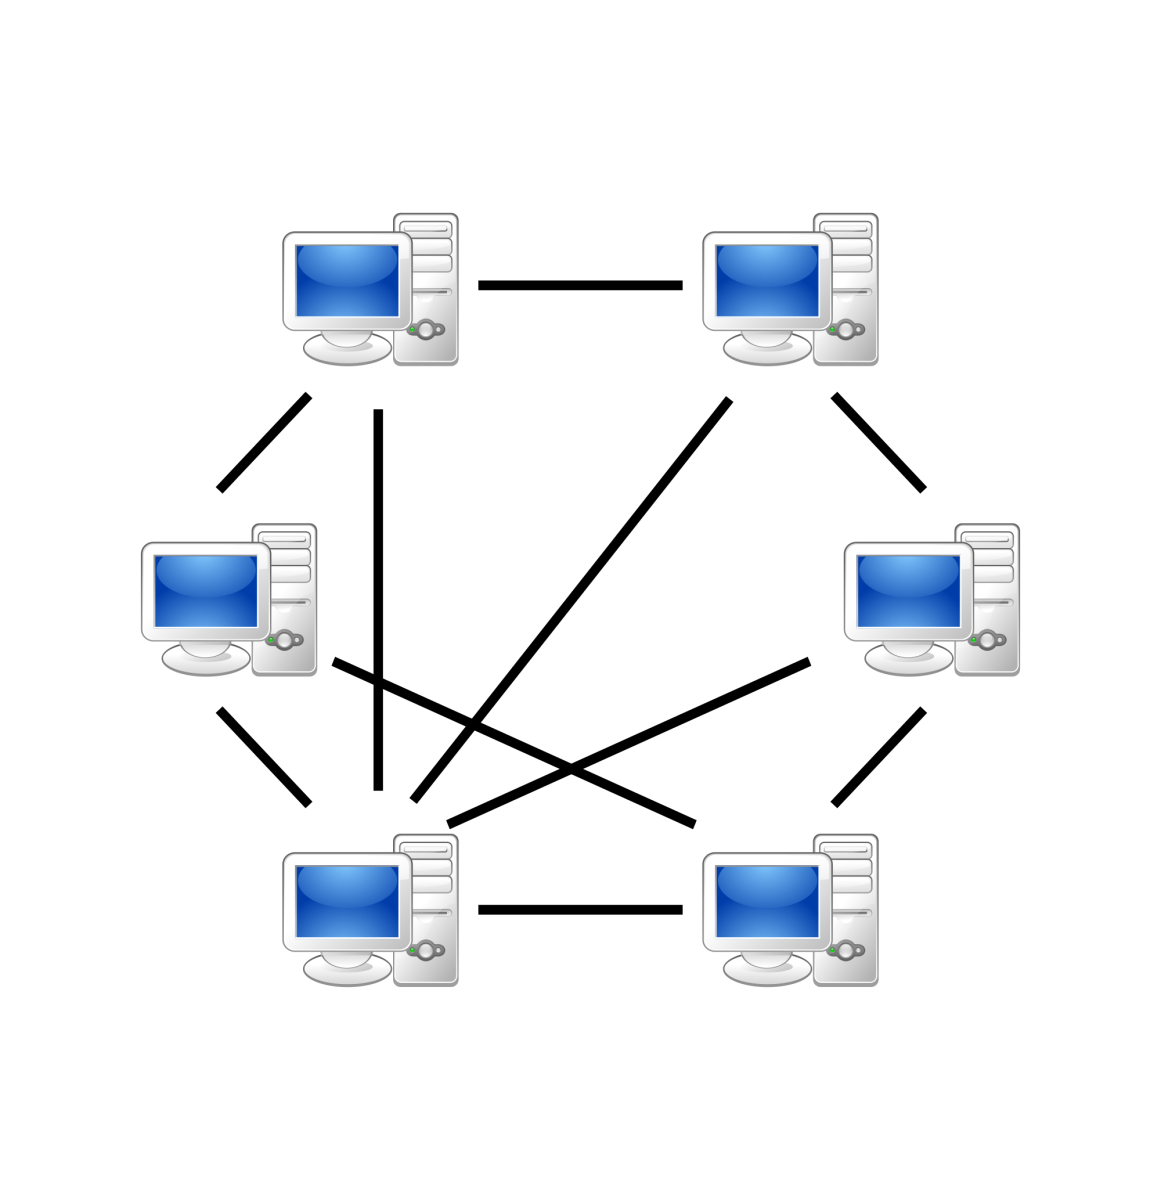 P2P Network Model